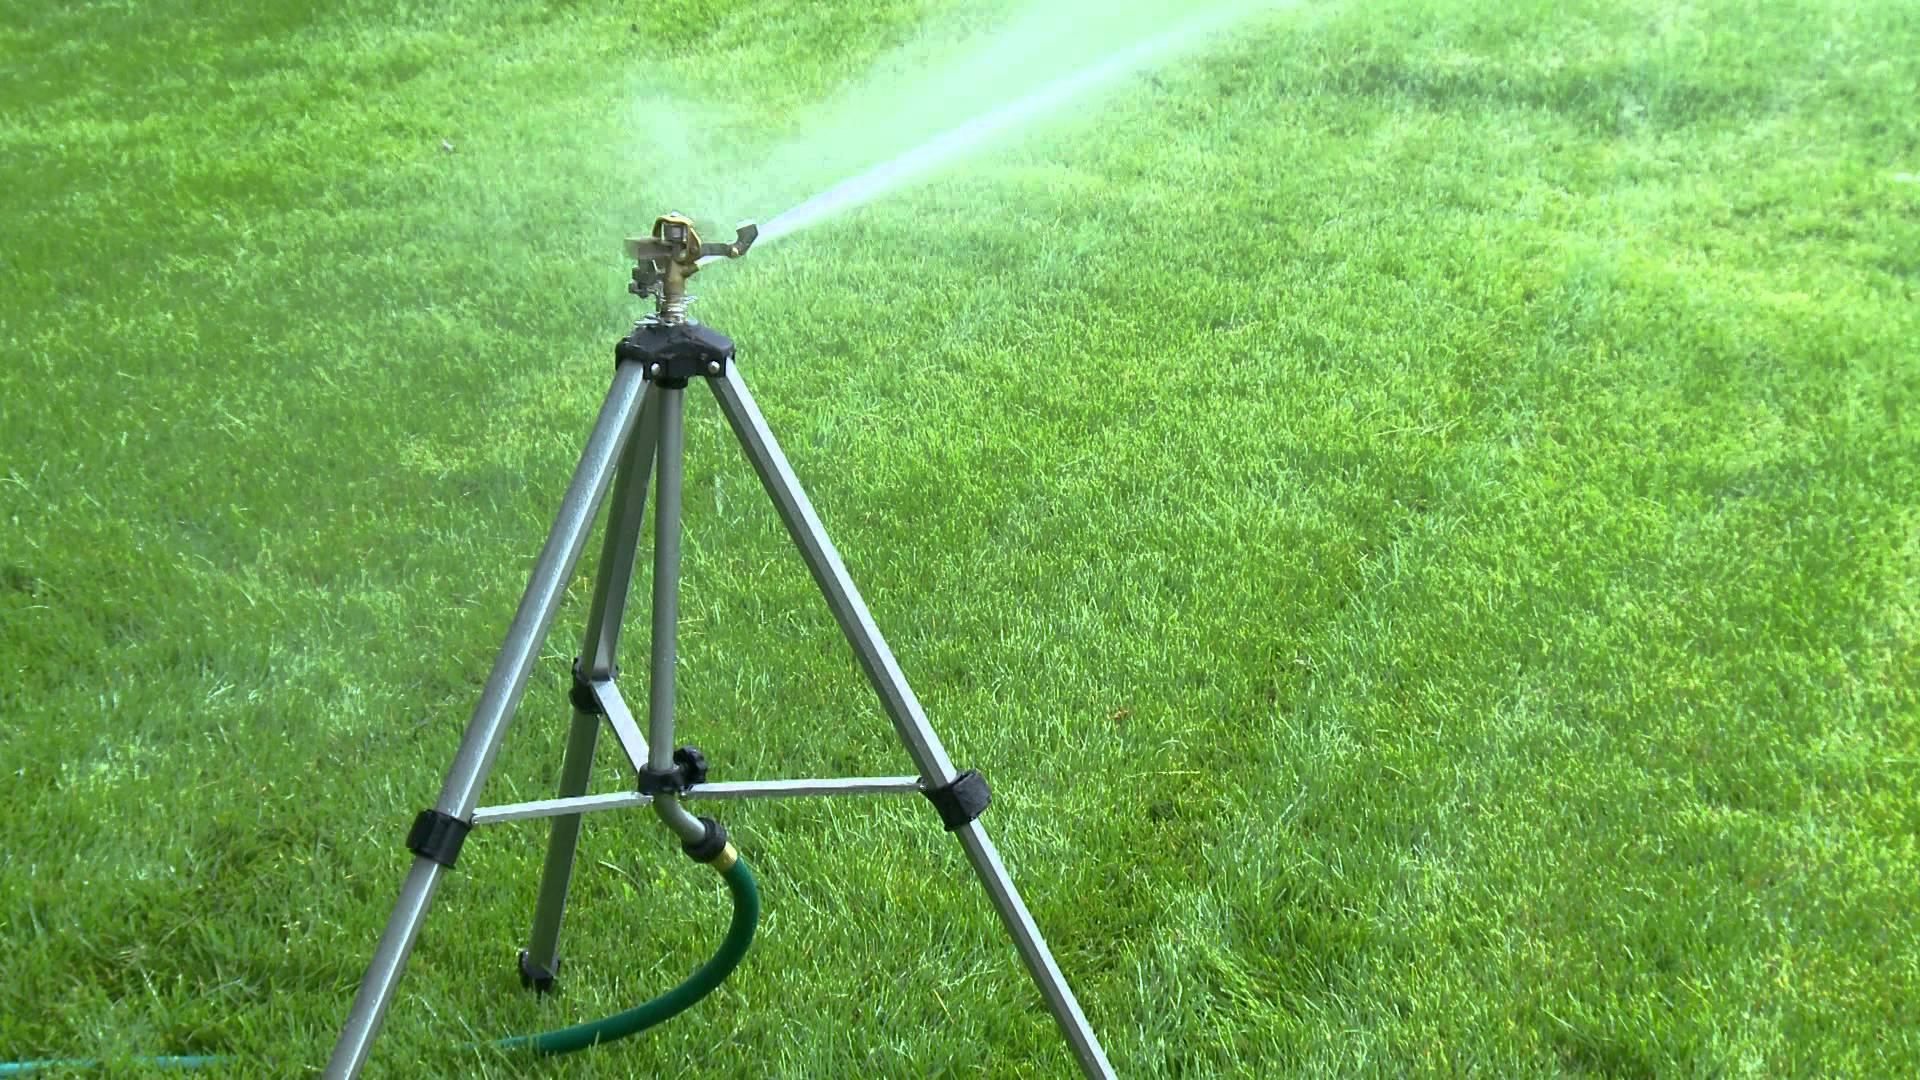 Best Tripod Lawn Sprinklers grass